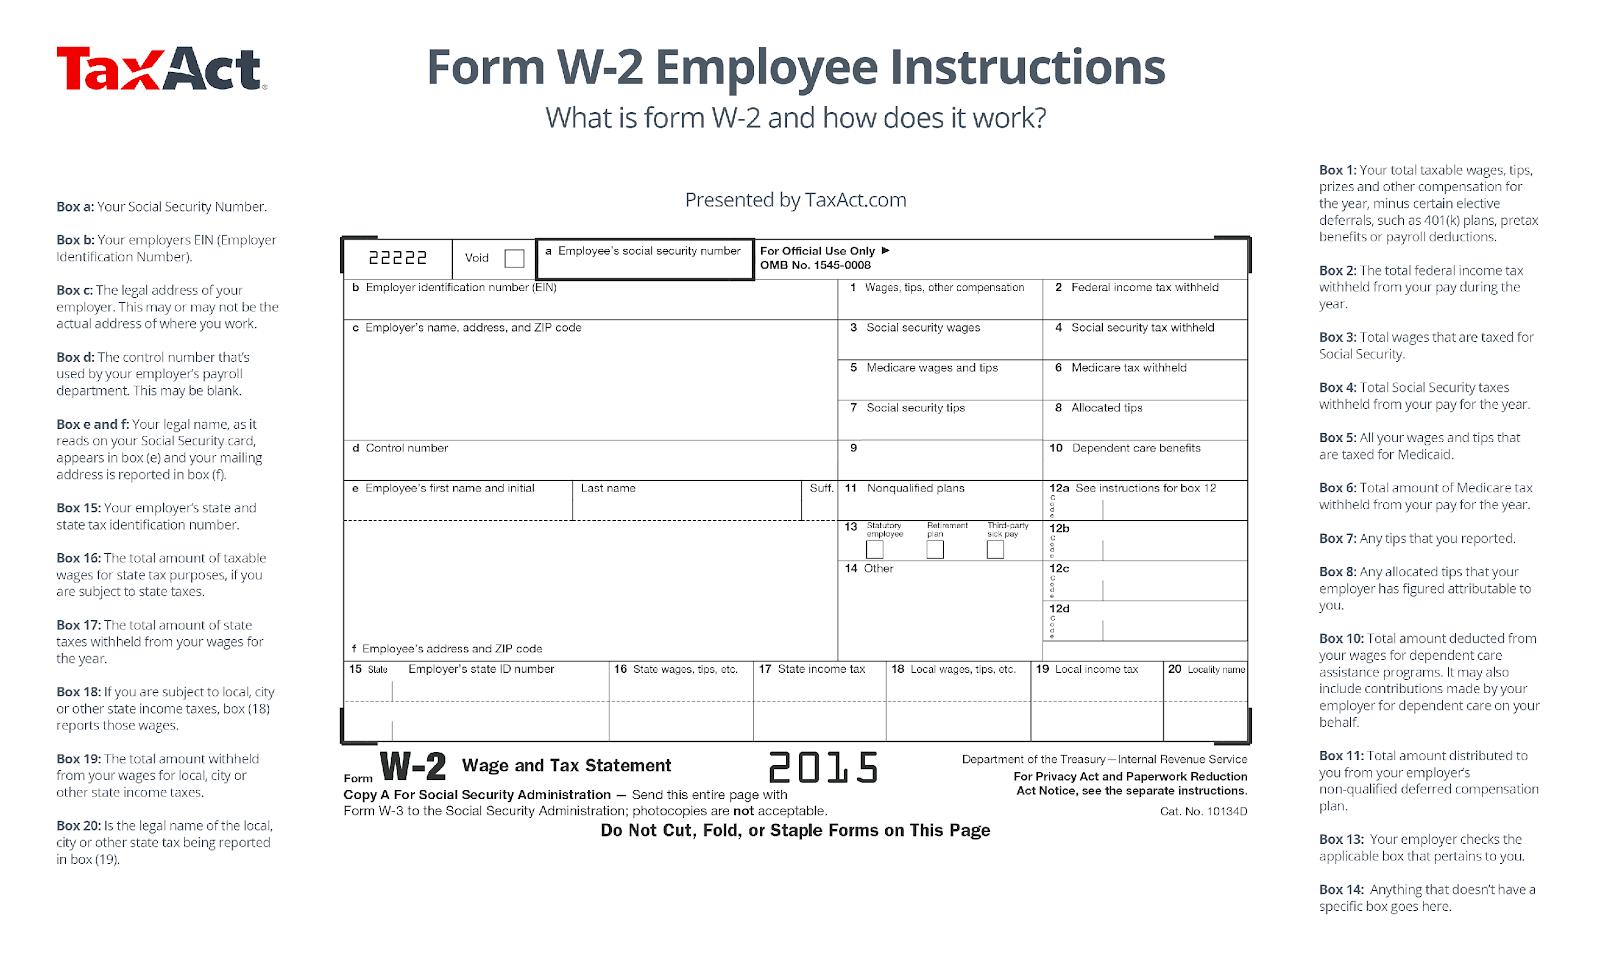 https://blog.taxact.com/wp-content/uploads/Form-W-2-Employee-Instructions-1.png